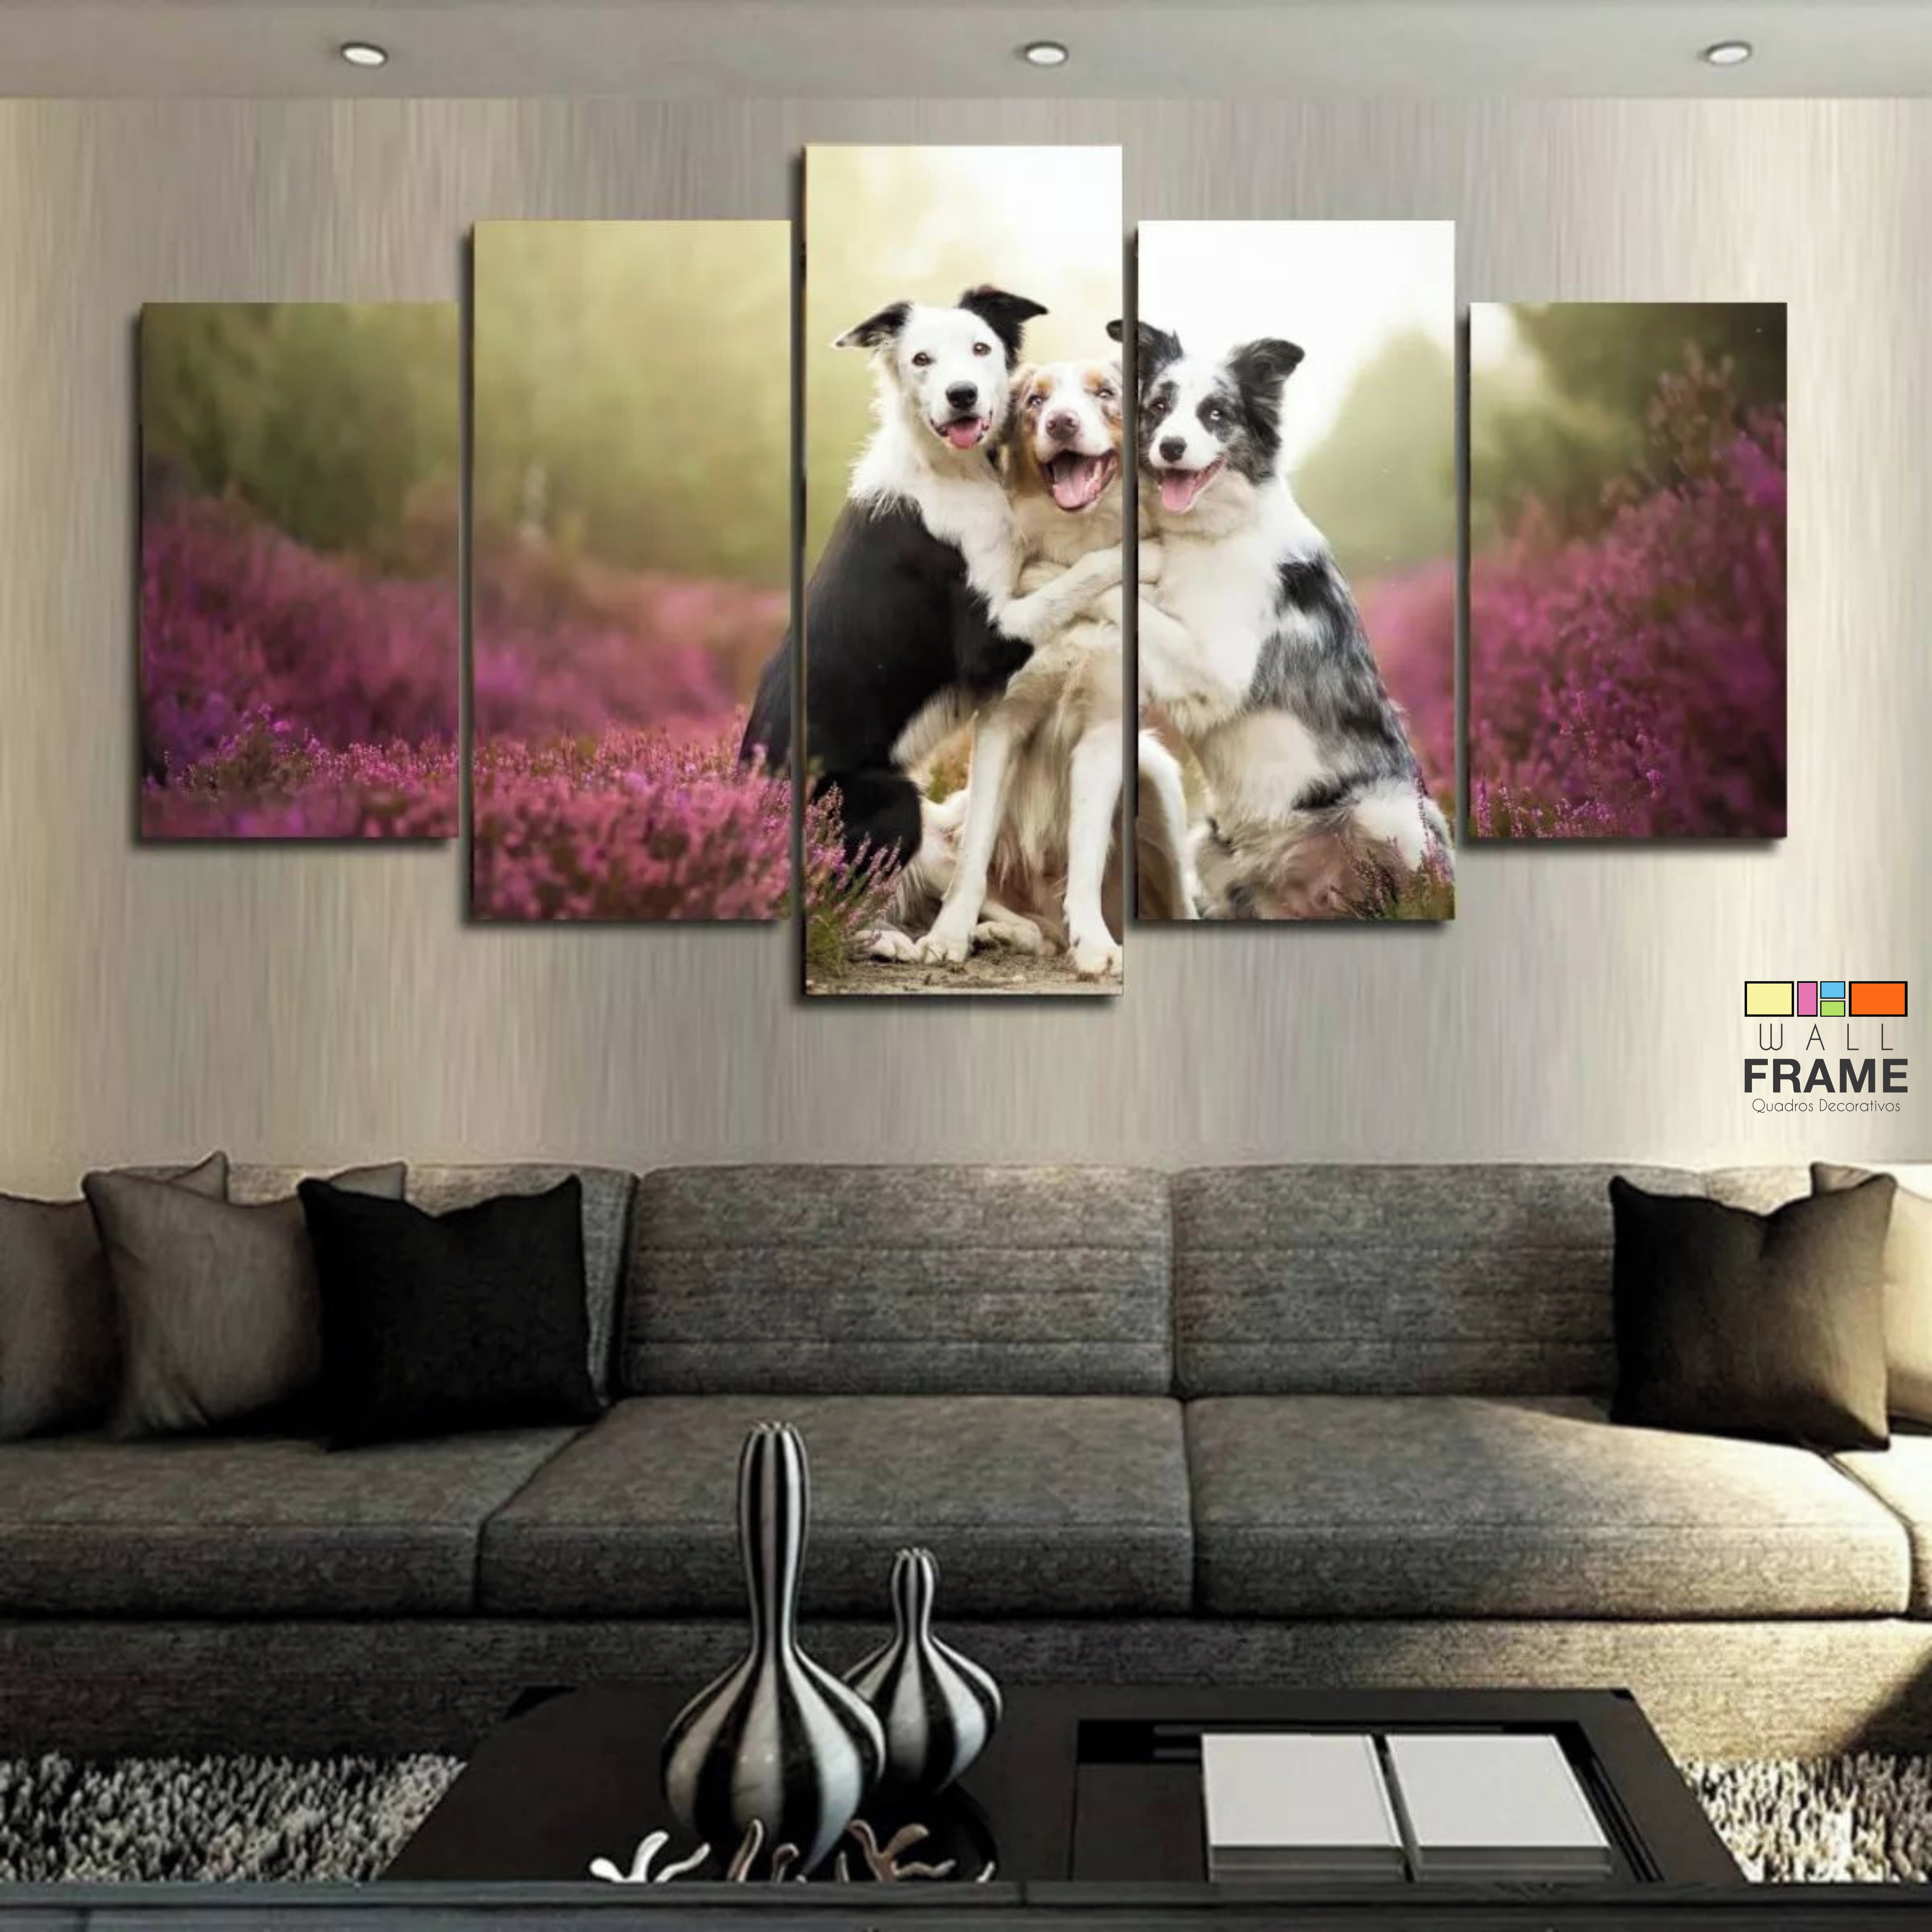 Quadro Gato Decoracao Salas Interiores Pet Shop Decorar   Elo7 2297a80f35